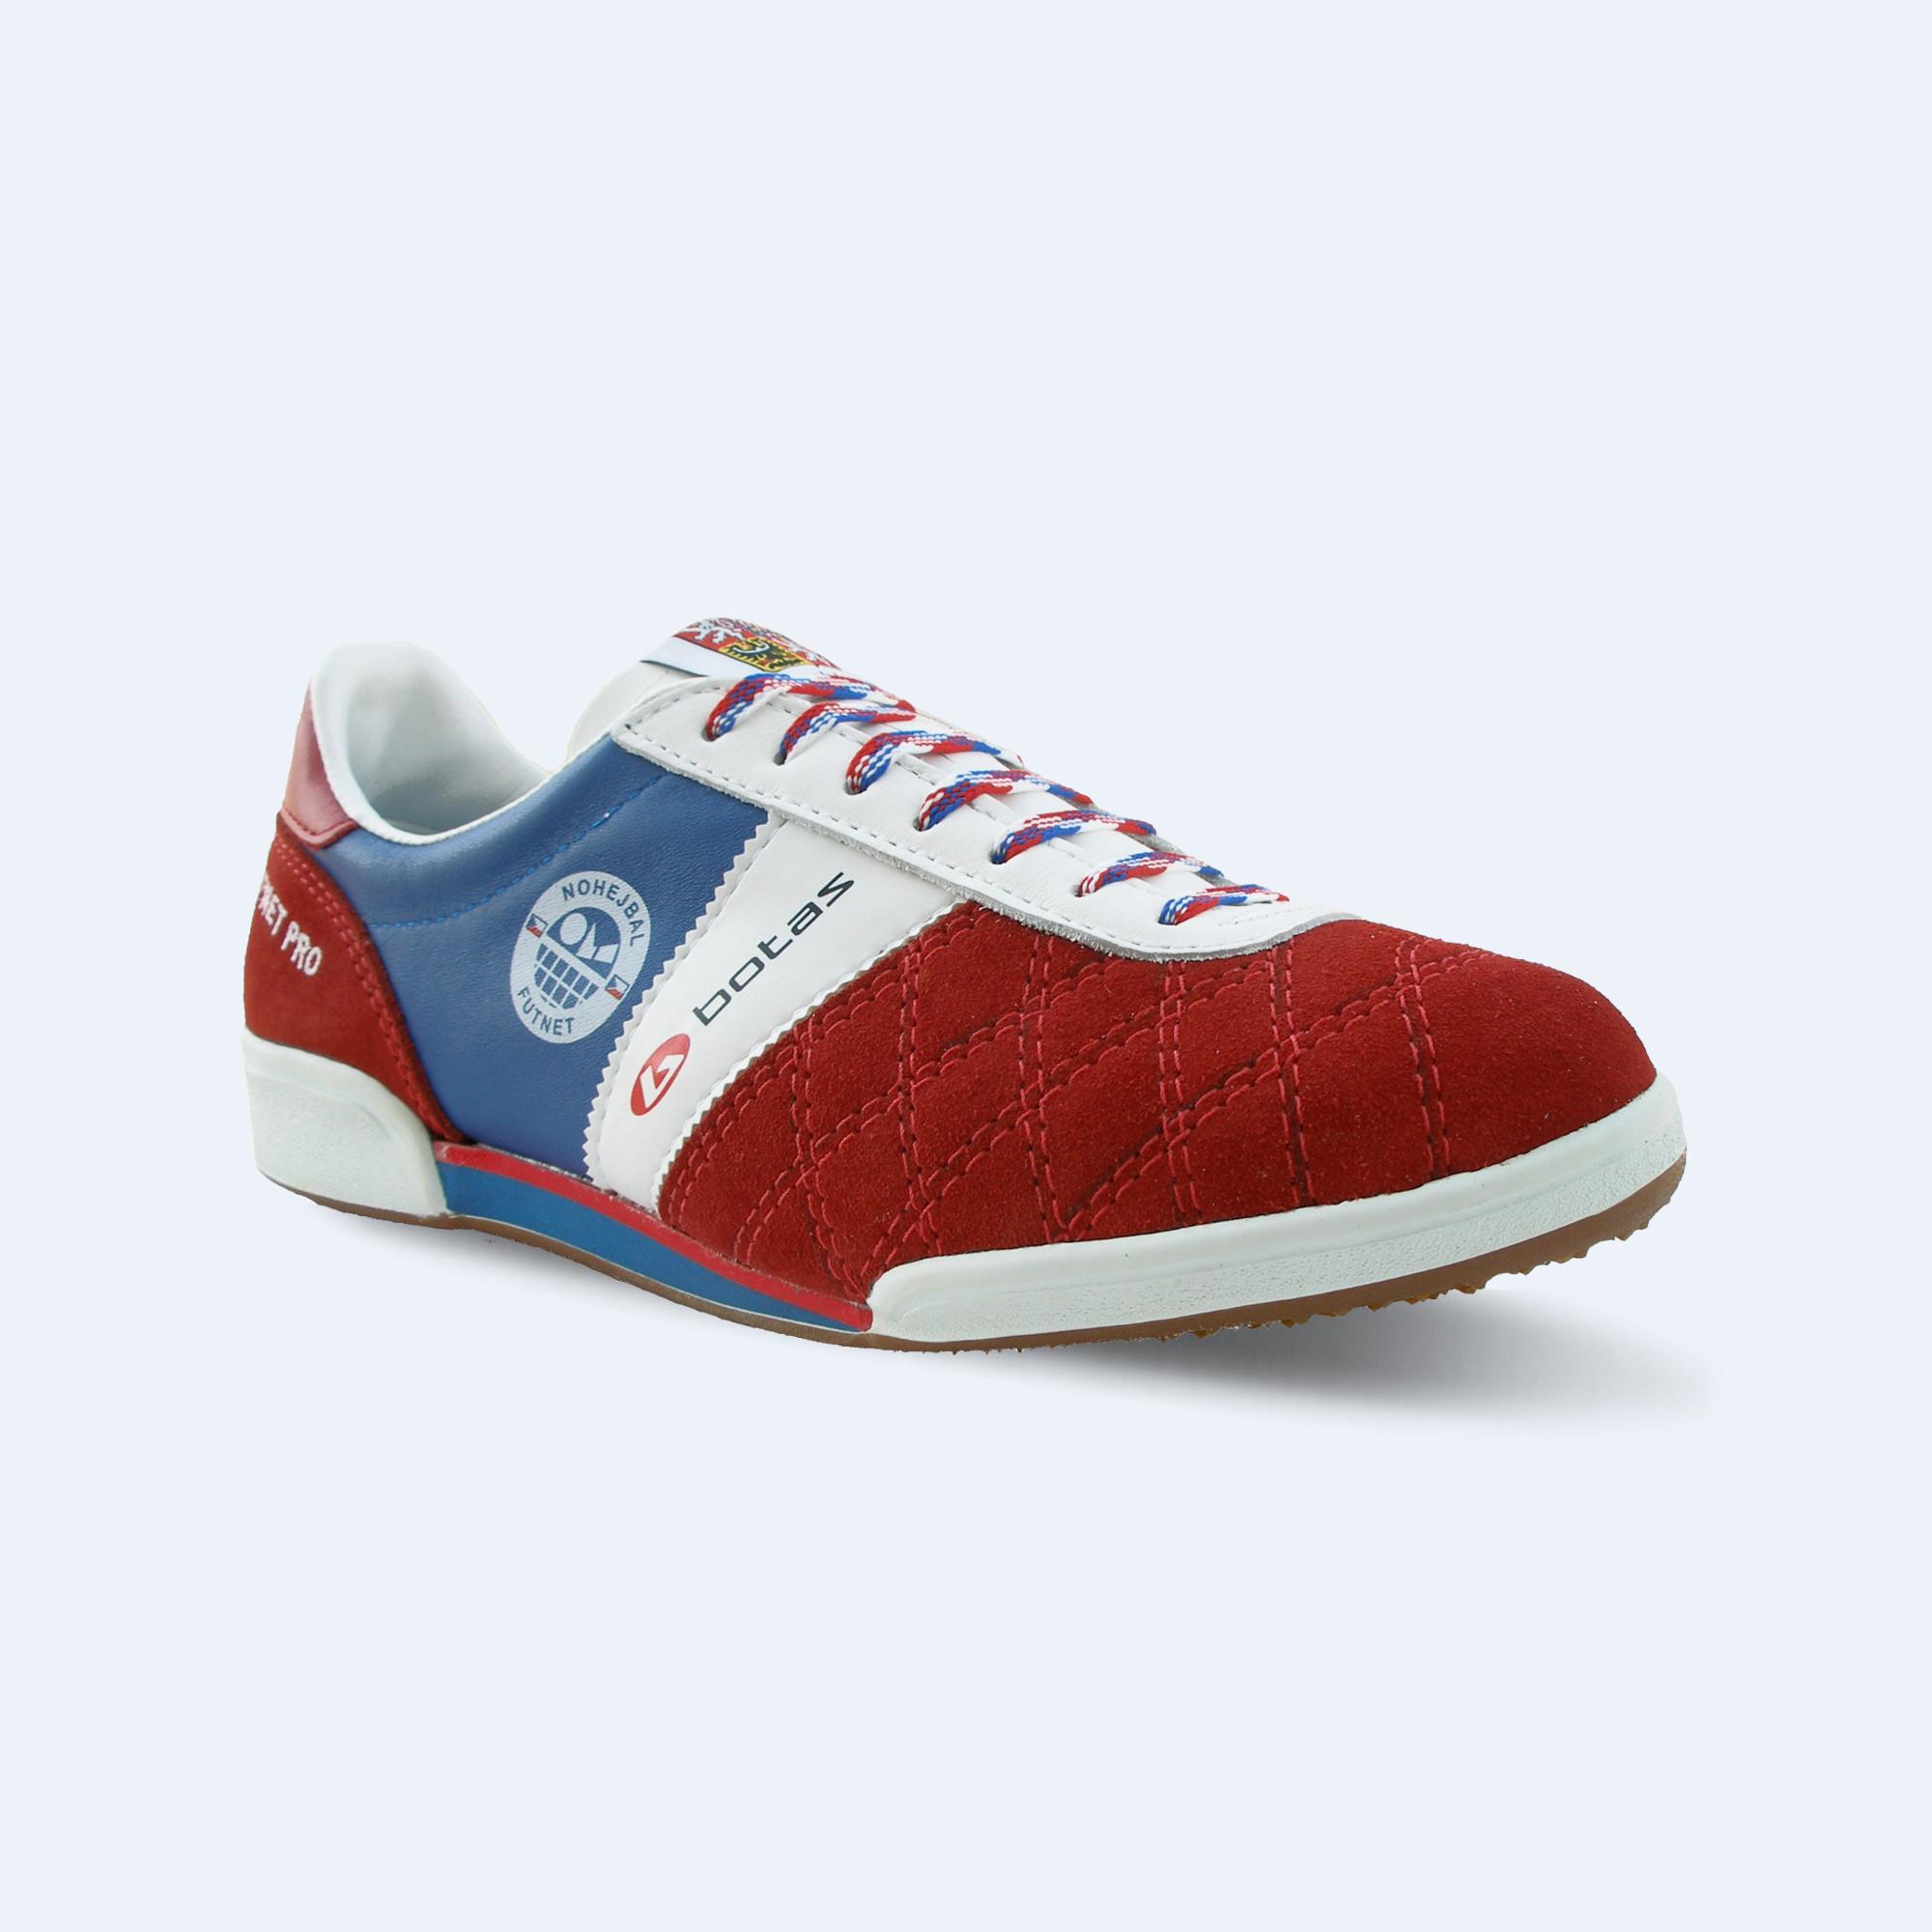 bf9b0aad3a8 halová obuv botas FUTNET PRO